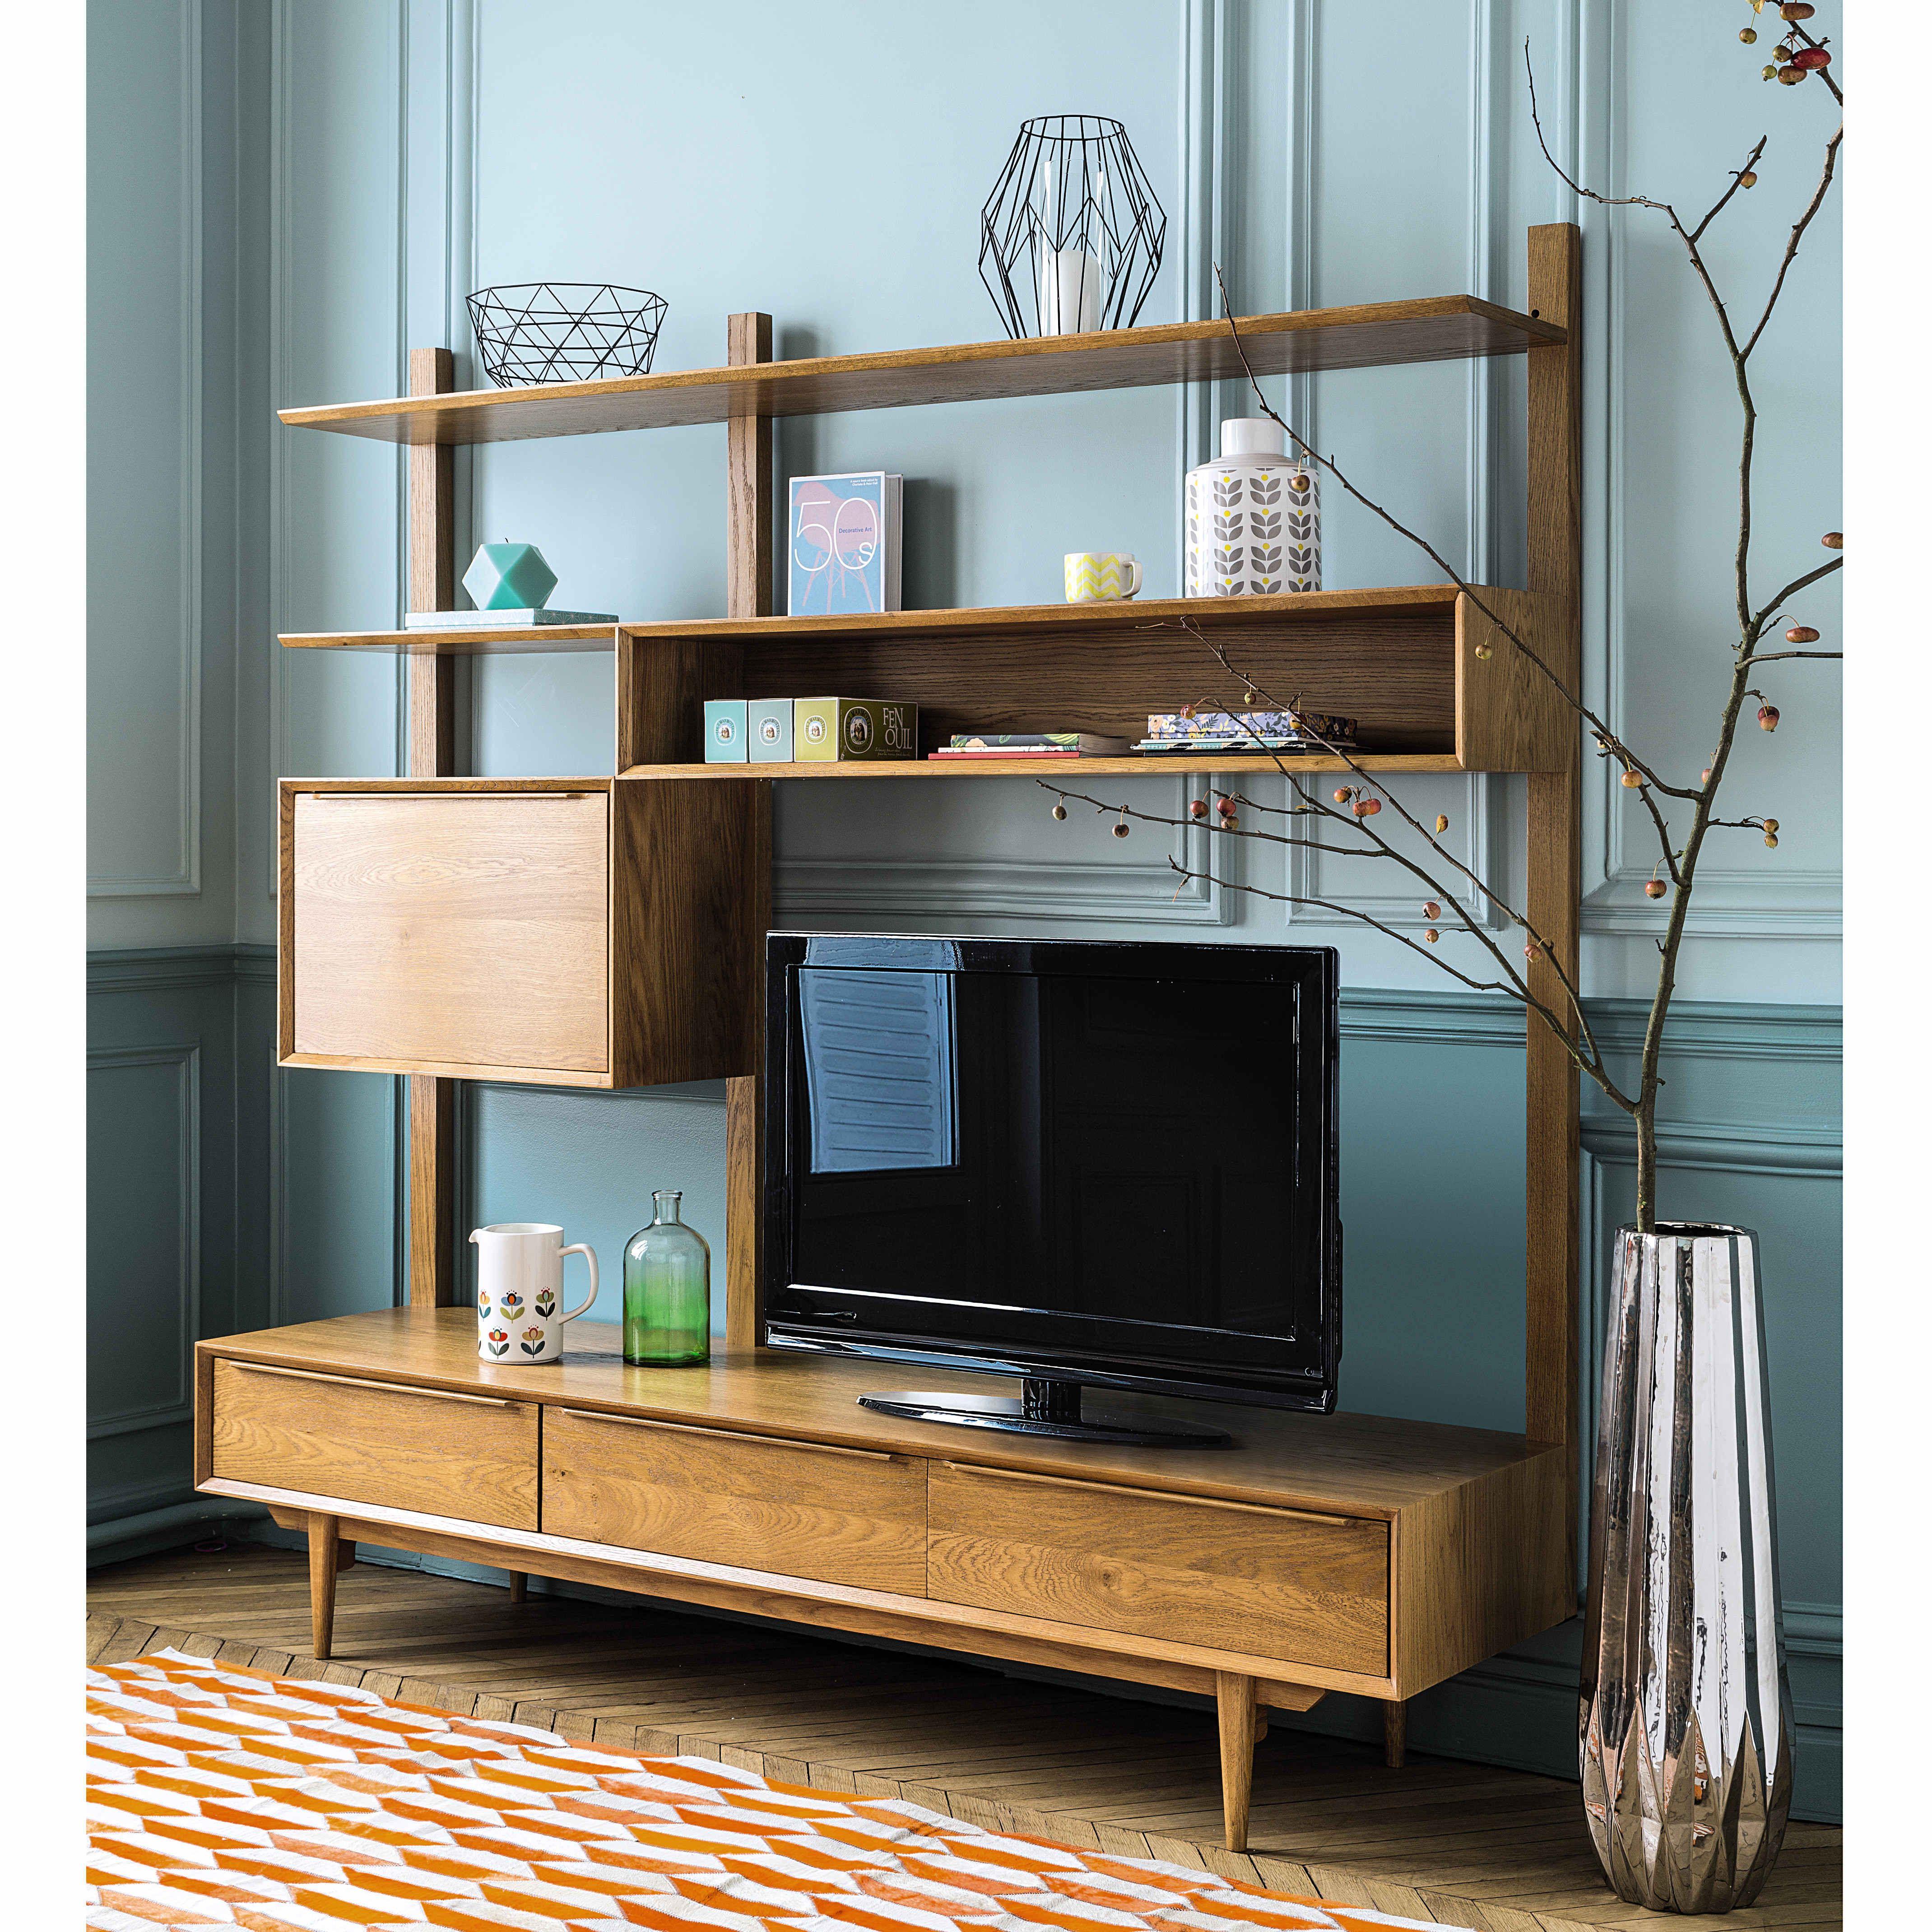 Visualizza altre idee su mobili, arredamento, sedie d'epoca. Solid Oak Vintage Tv 3 Drawers 1 Door Shelf Unit Maisons Du Monde Arredamento Salotto Vintage Tv D Epoca Salotto Vintage